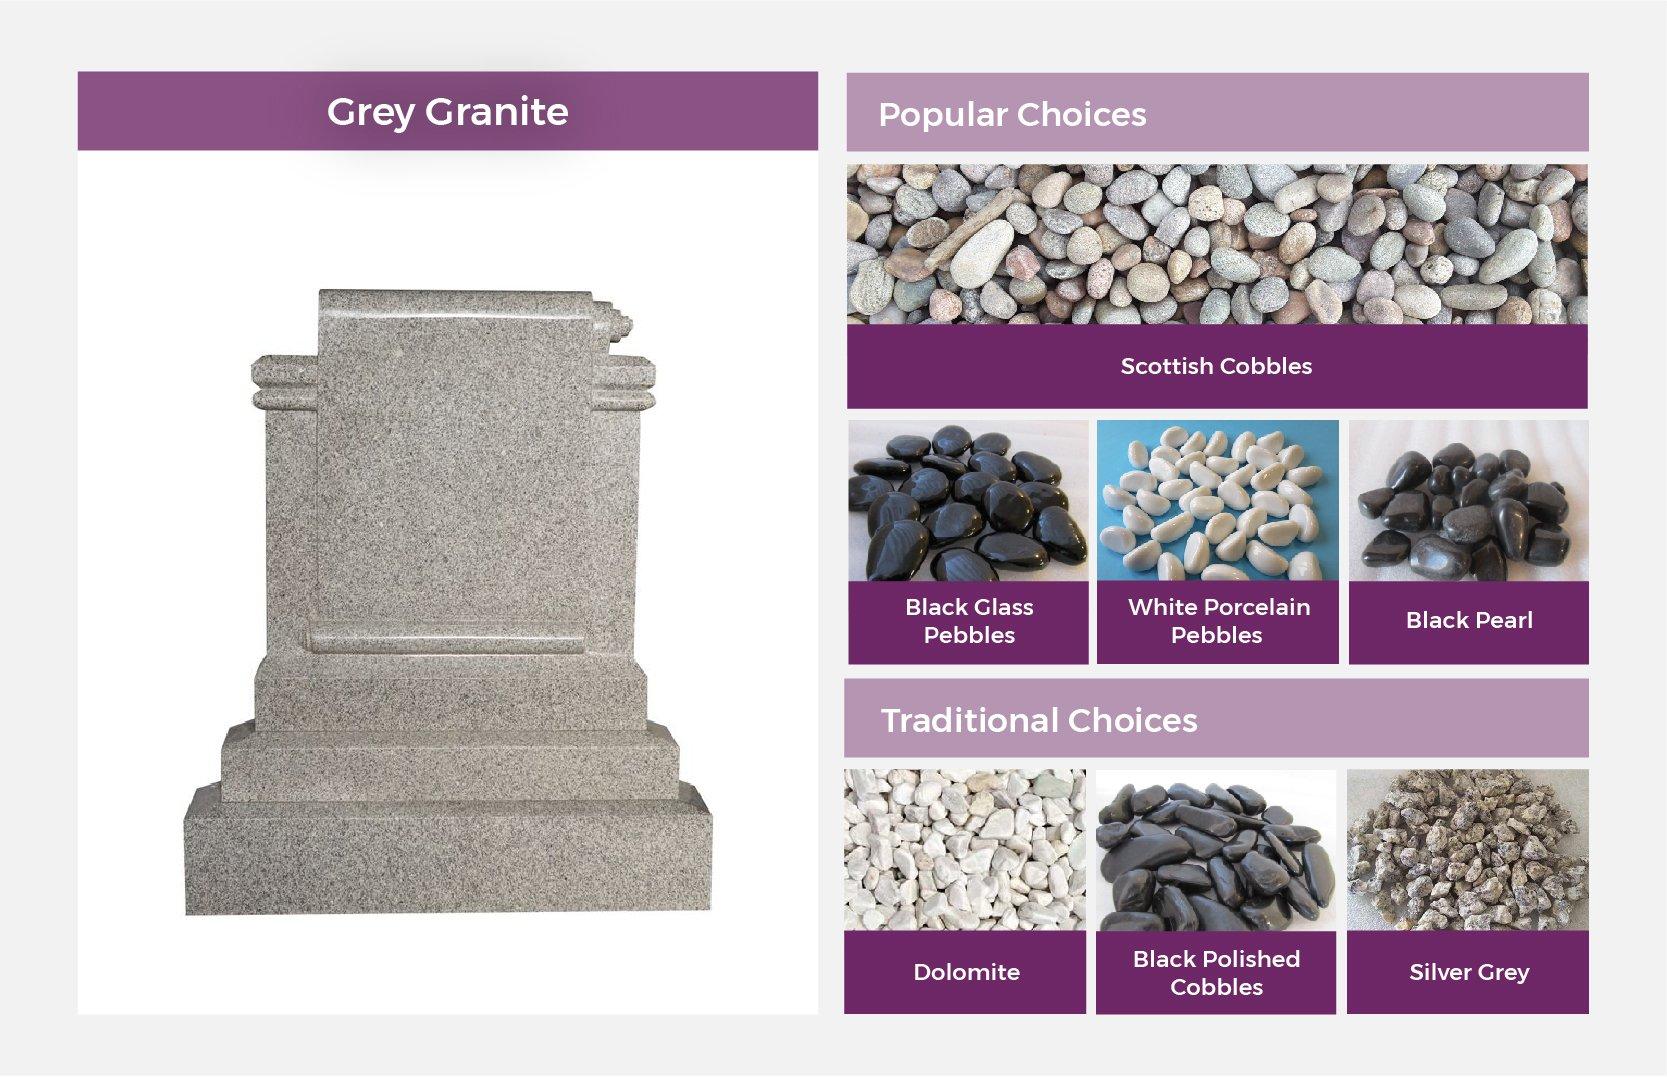 Grey Granite Headstone Pairing Stones